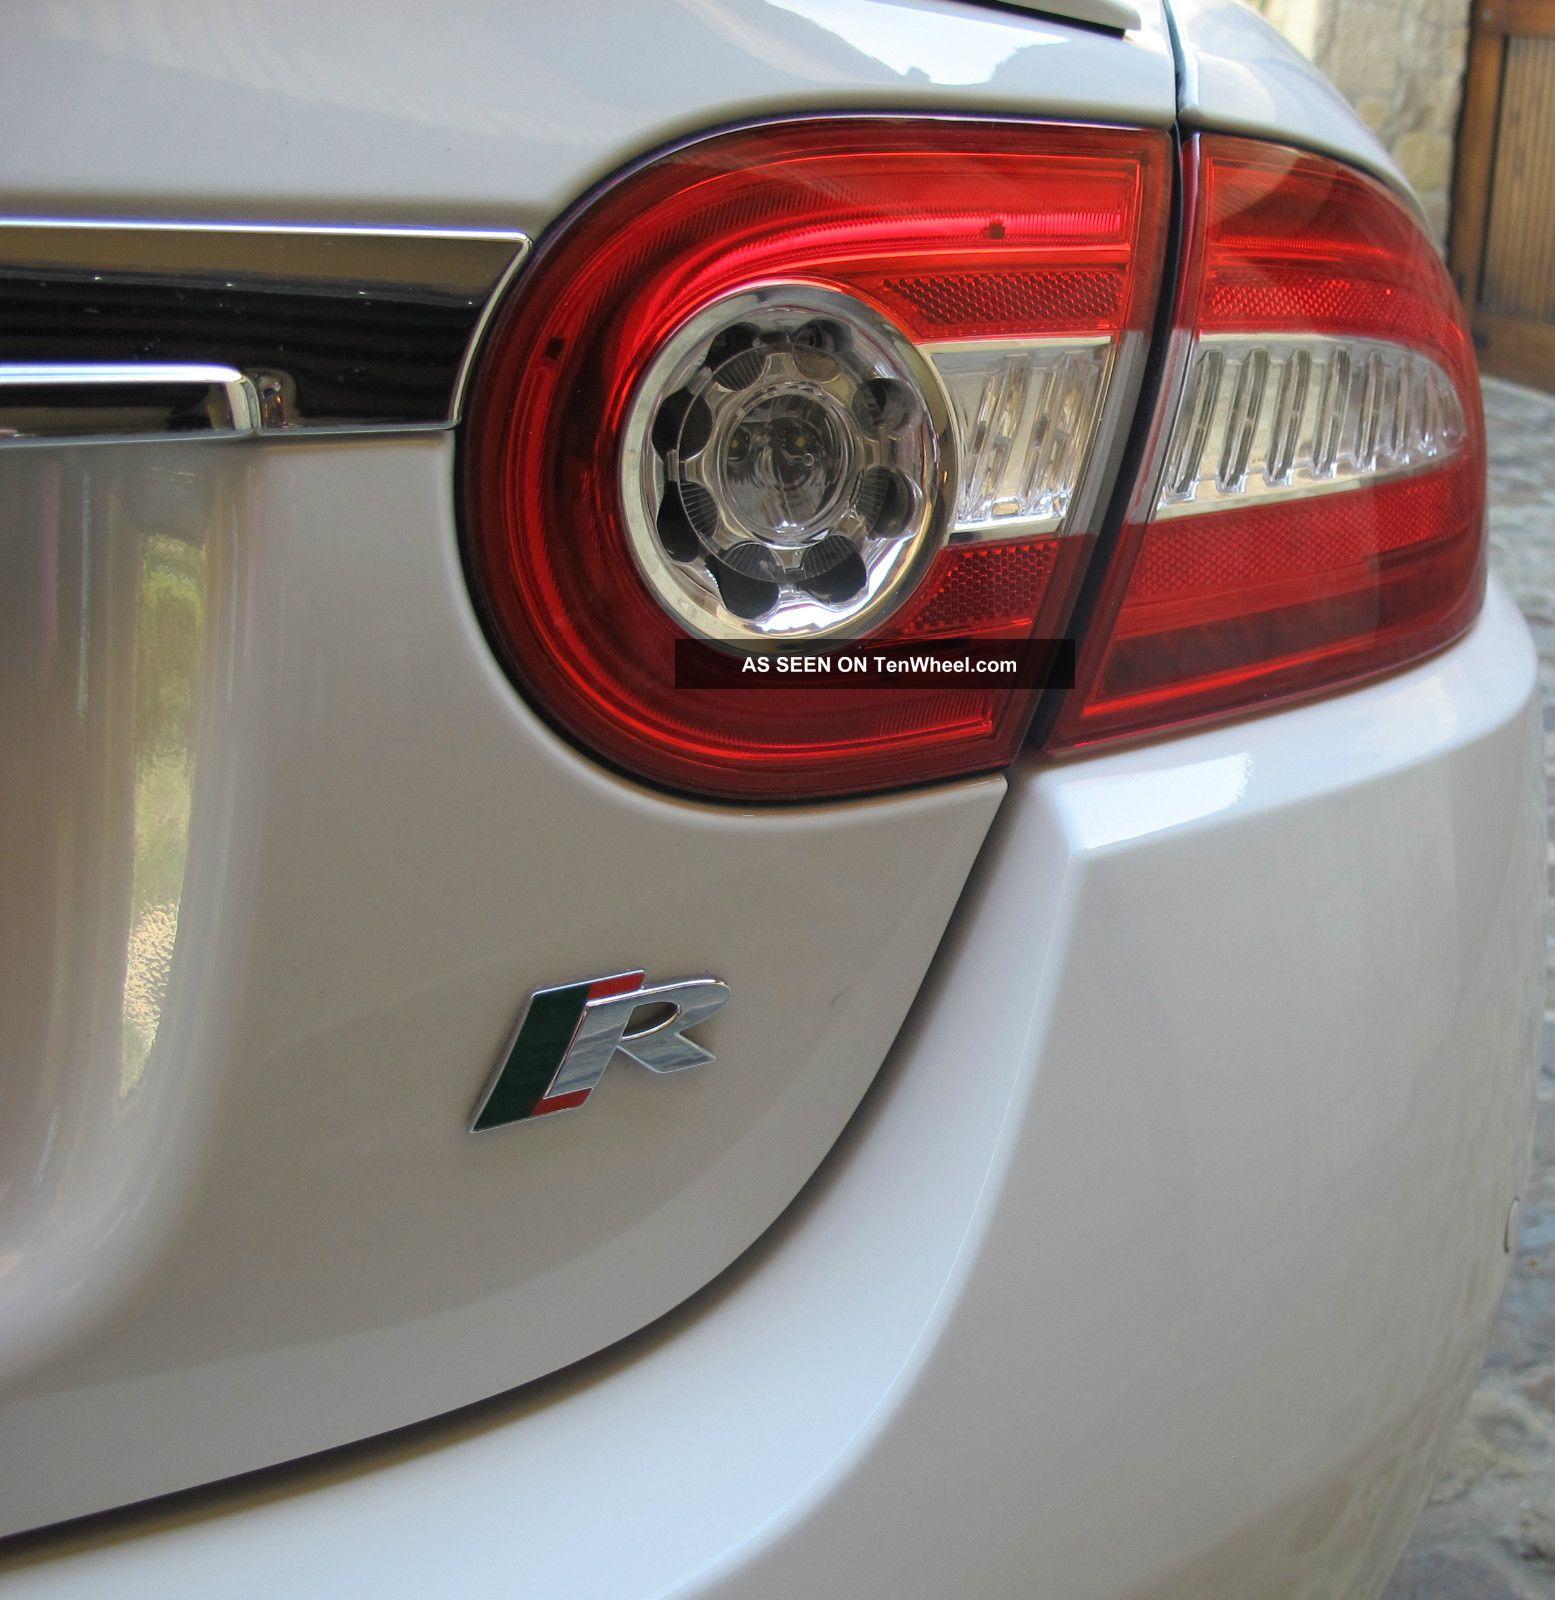 Jaguar For Sale In Houston: 2010 Jaguar Xkr Convertible 5. 0l W / Walnut Burlwood Trim